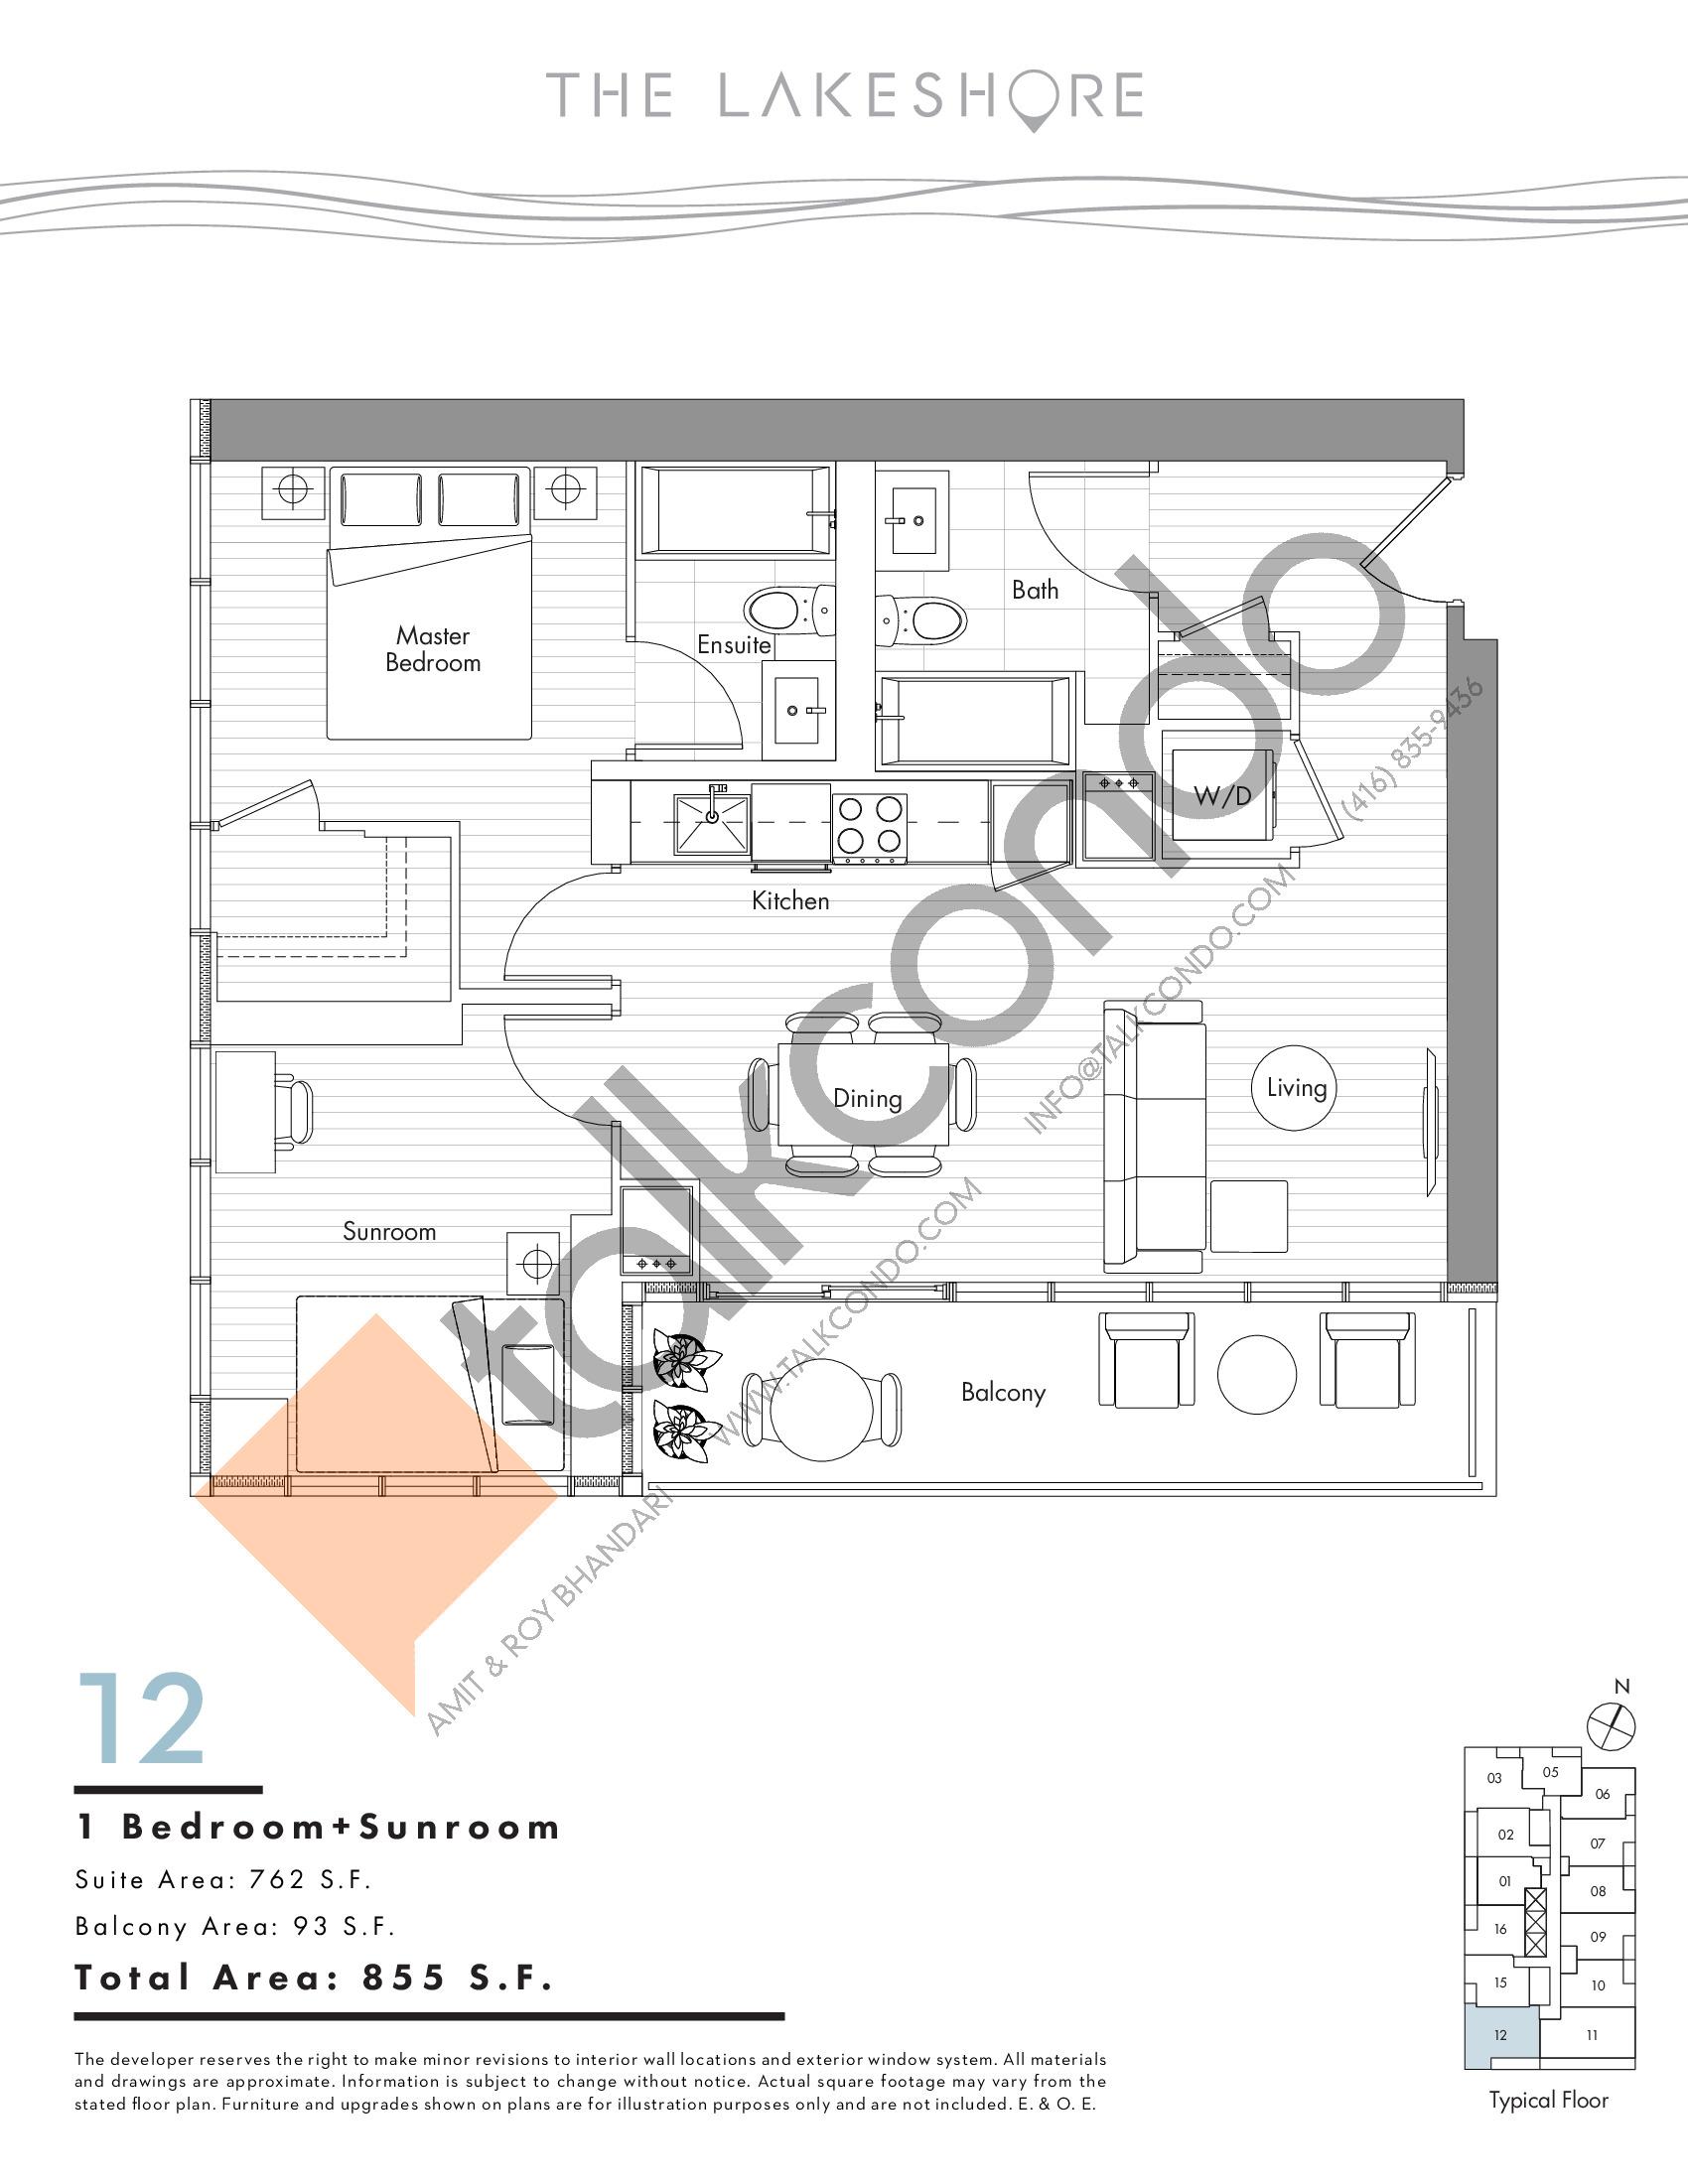 12 Floor Plan at The LakeShore Condos - 762 sq.ft